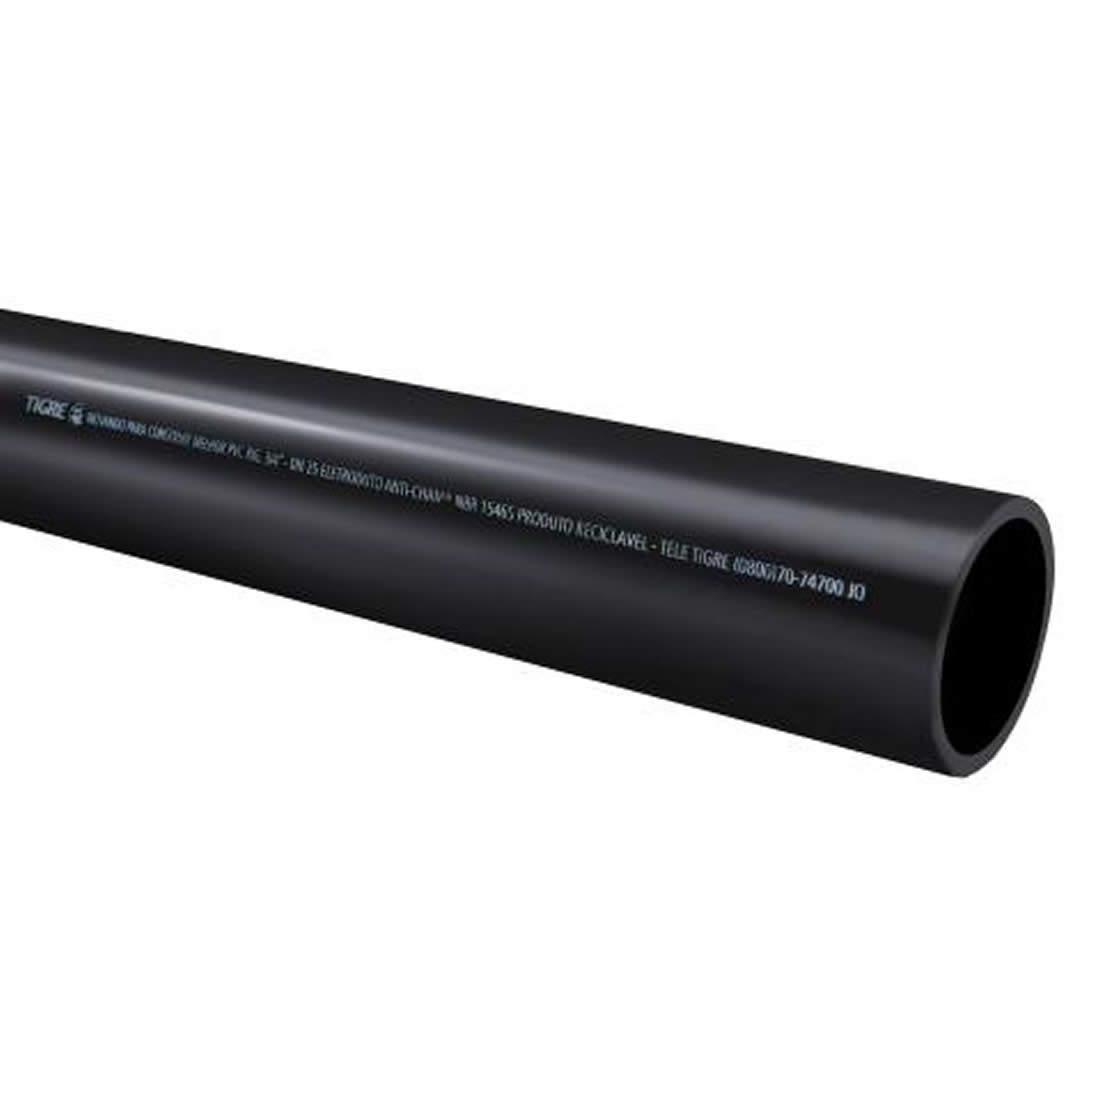 Tubo Eletroduto Soldável Antichama 60mm X 3 Metros Tigre